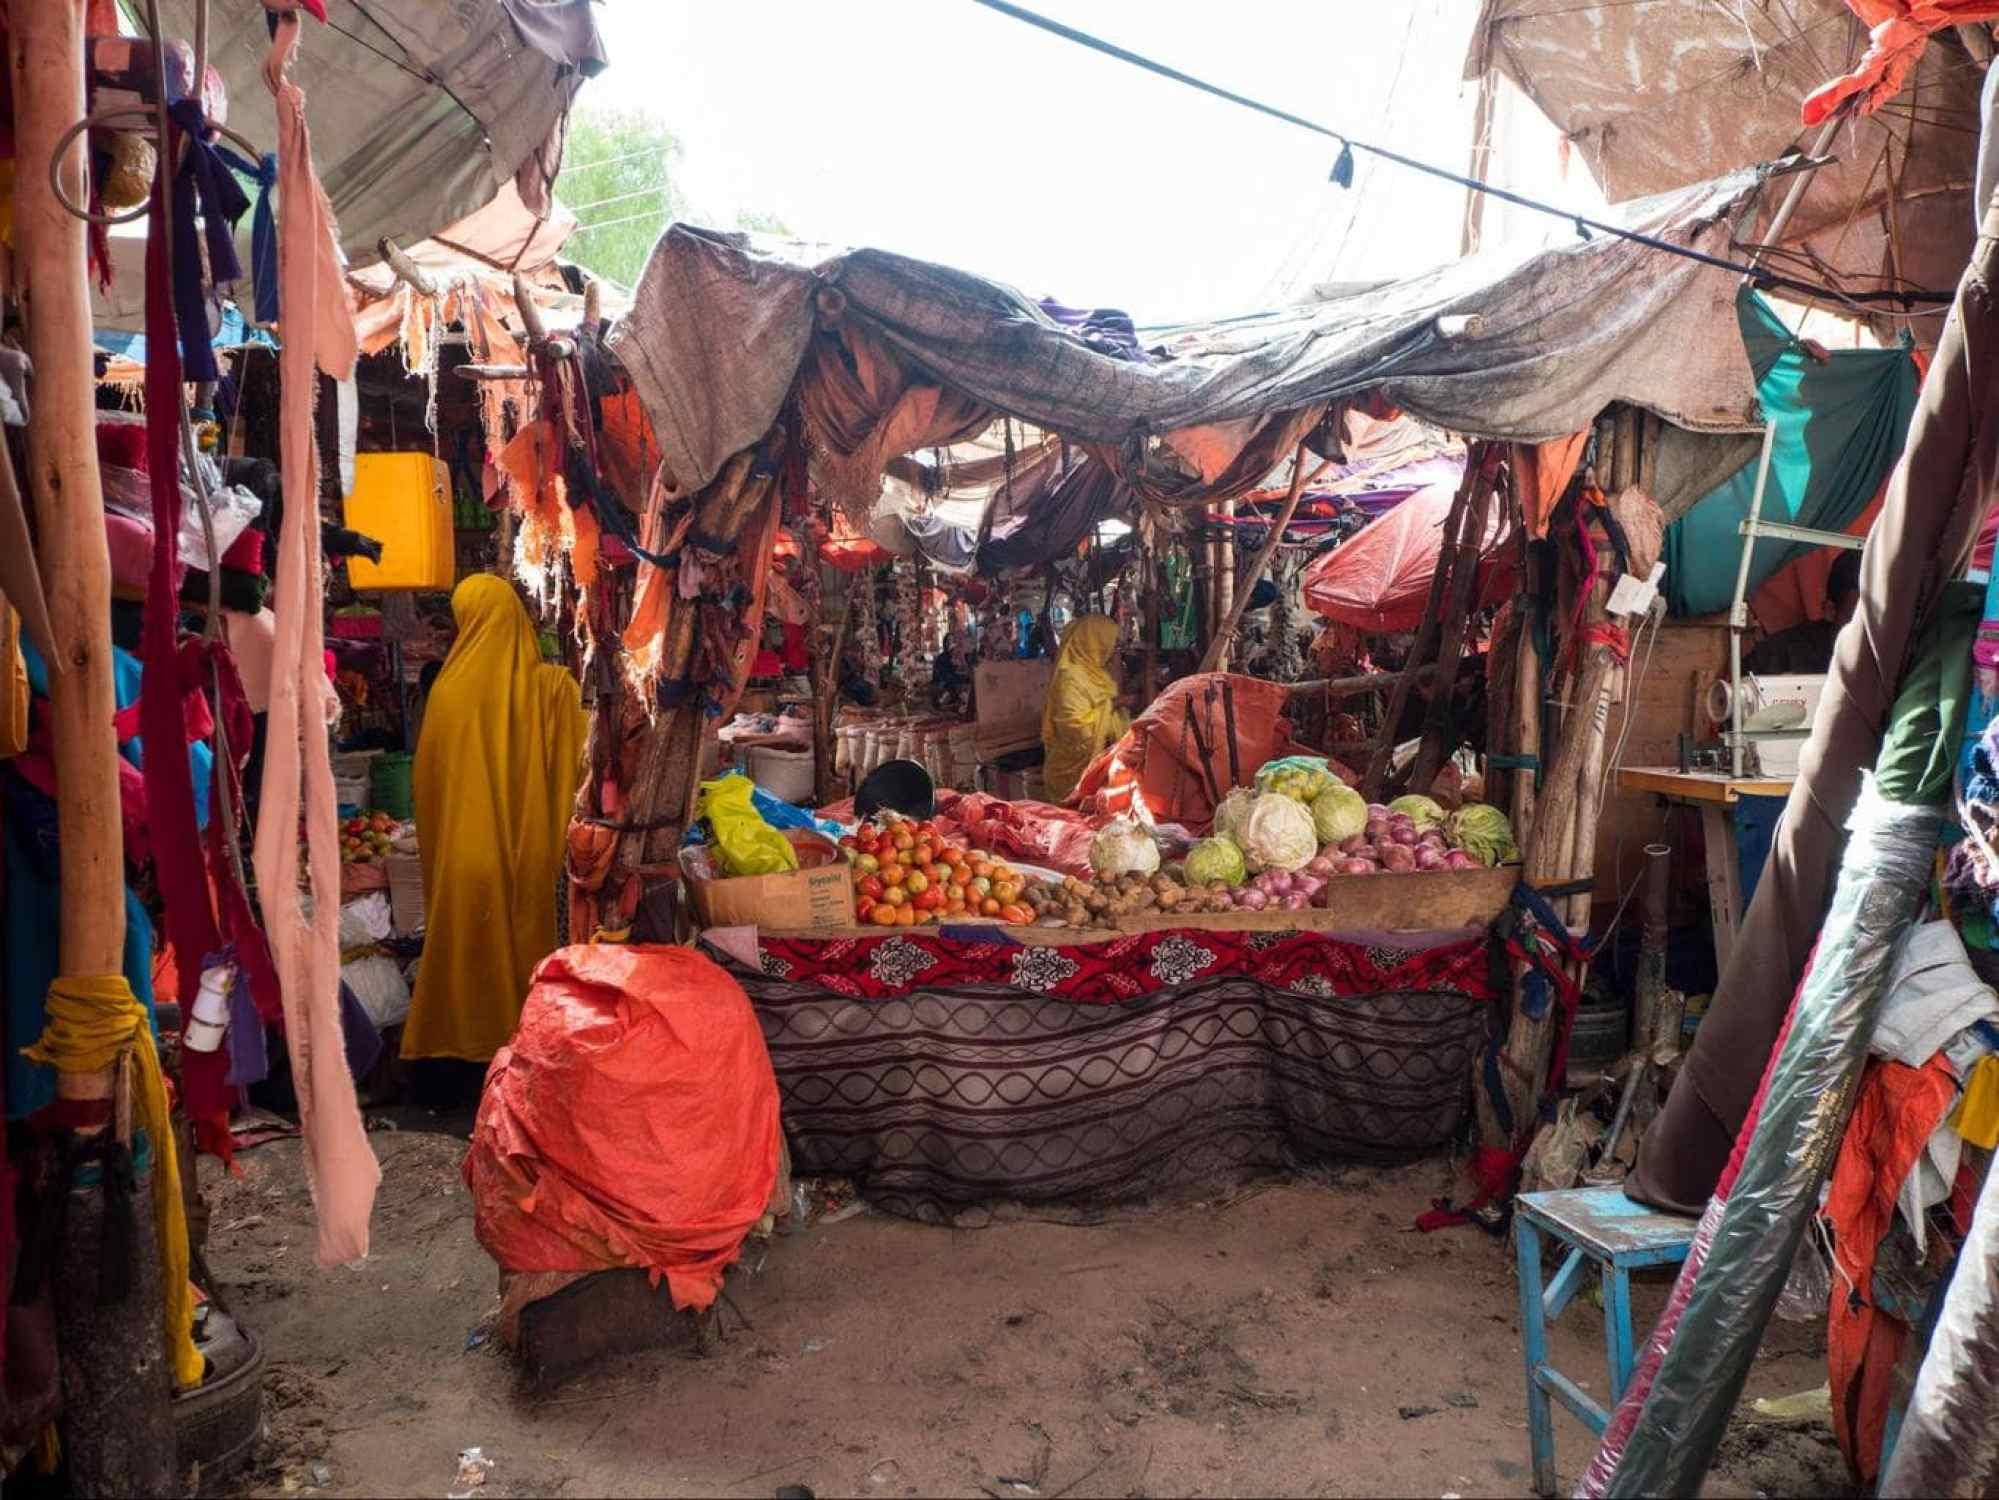 Hargeisa Central Market vendor